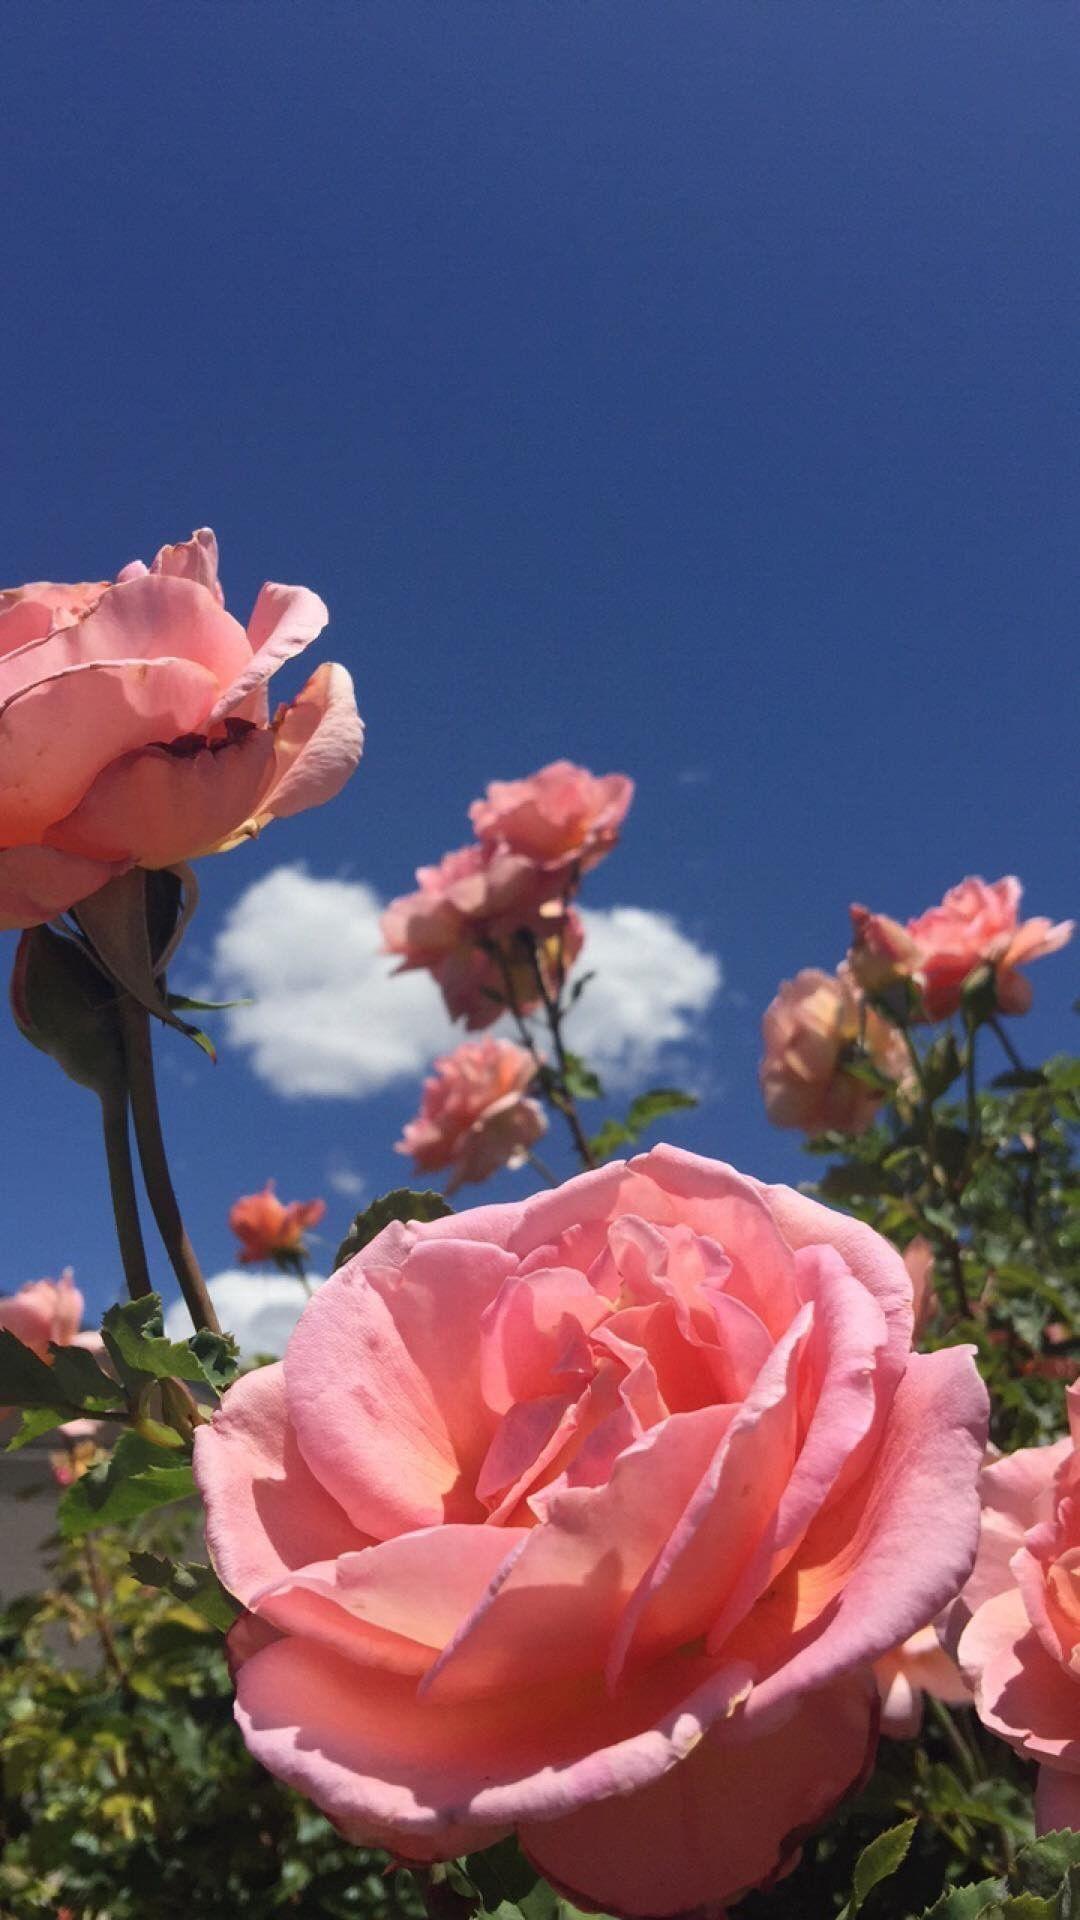 I Wanna Feel Love With Him Again Feel Love Wanna Flower Aesthetic Aesthetic Roses Blue Wallpaper Iphone